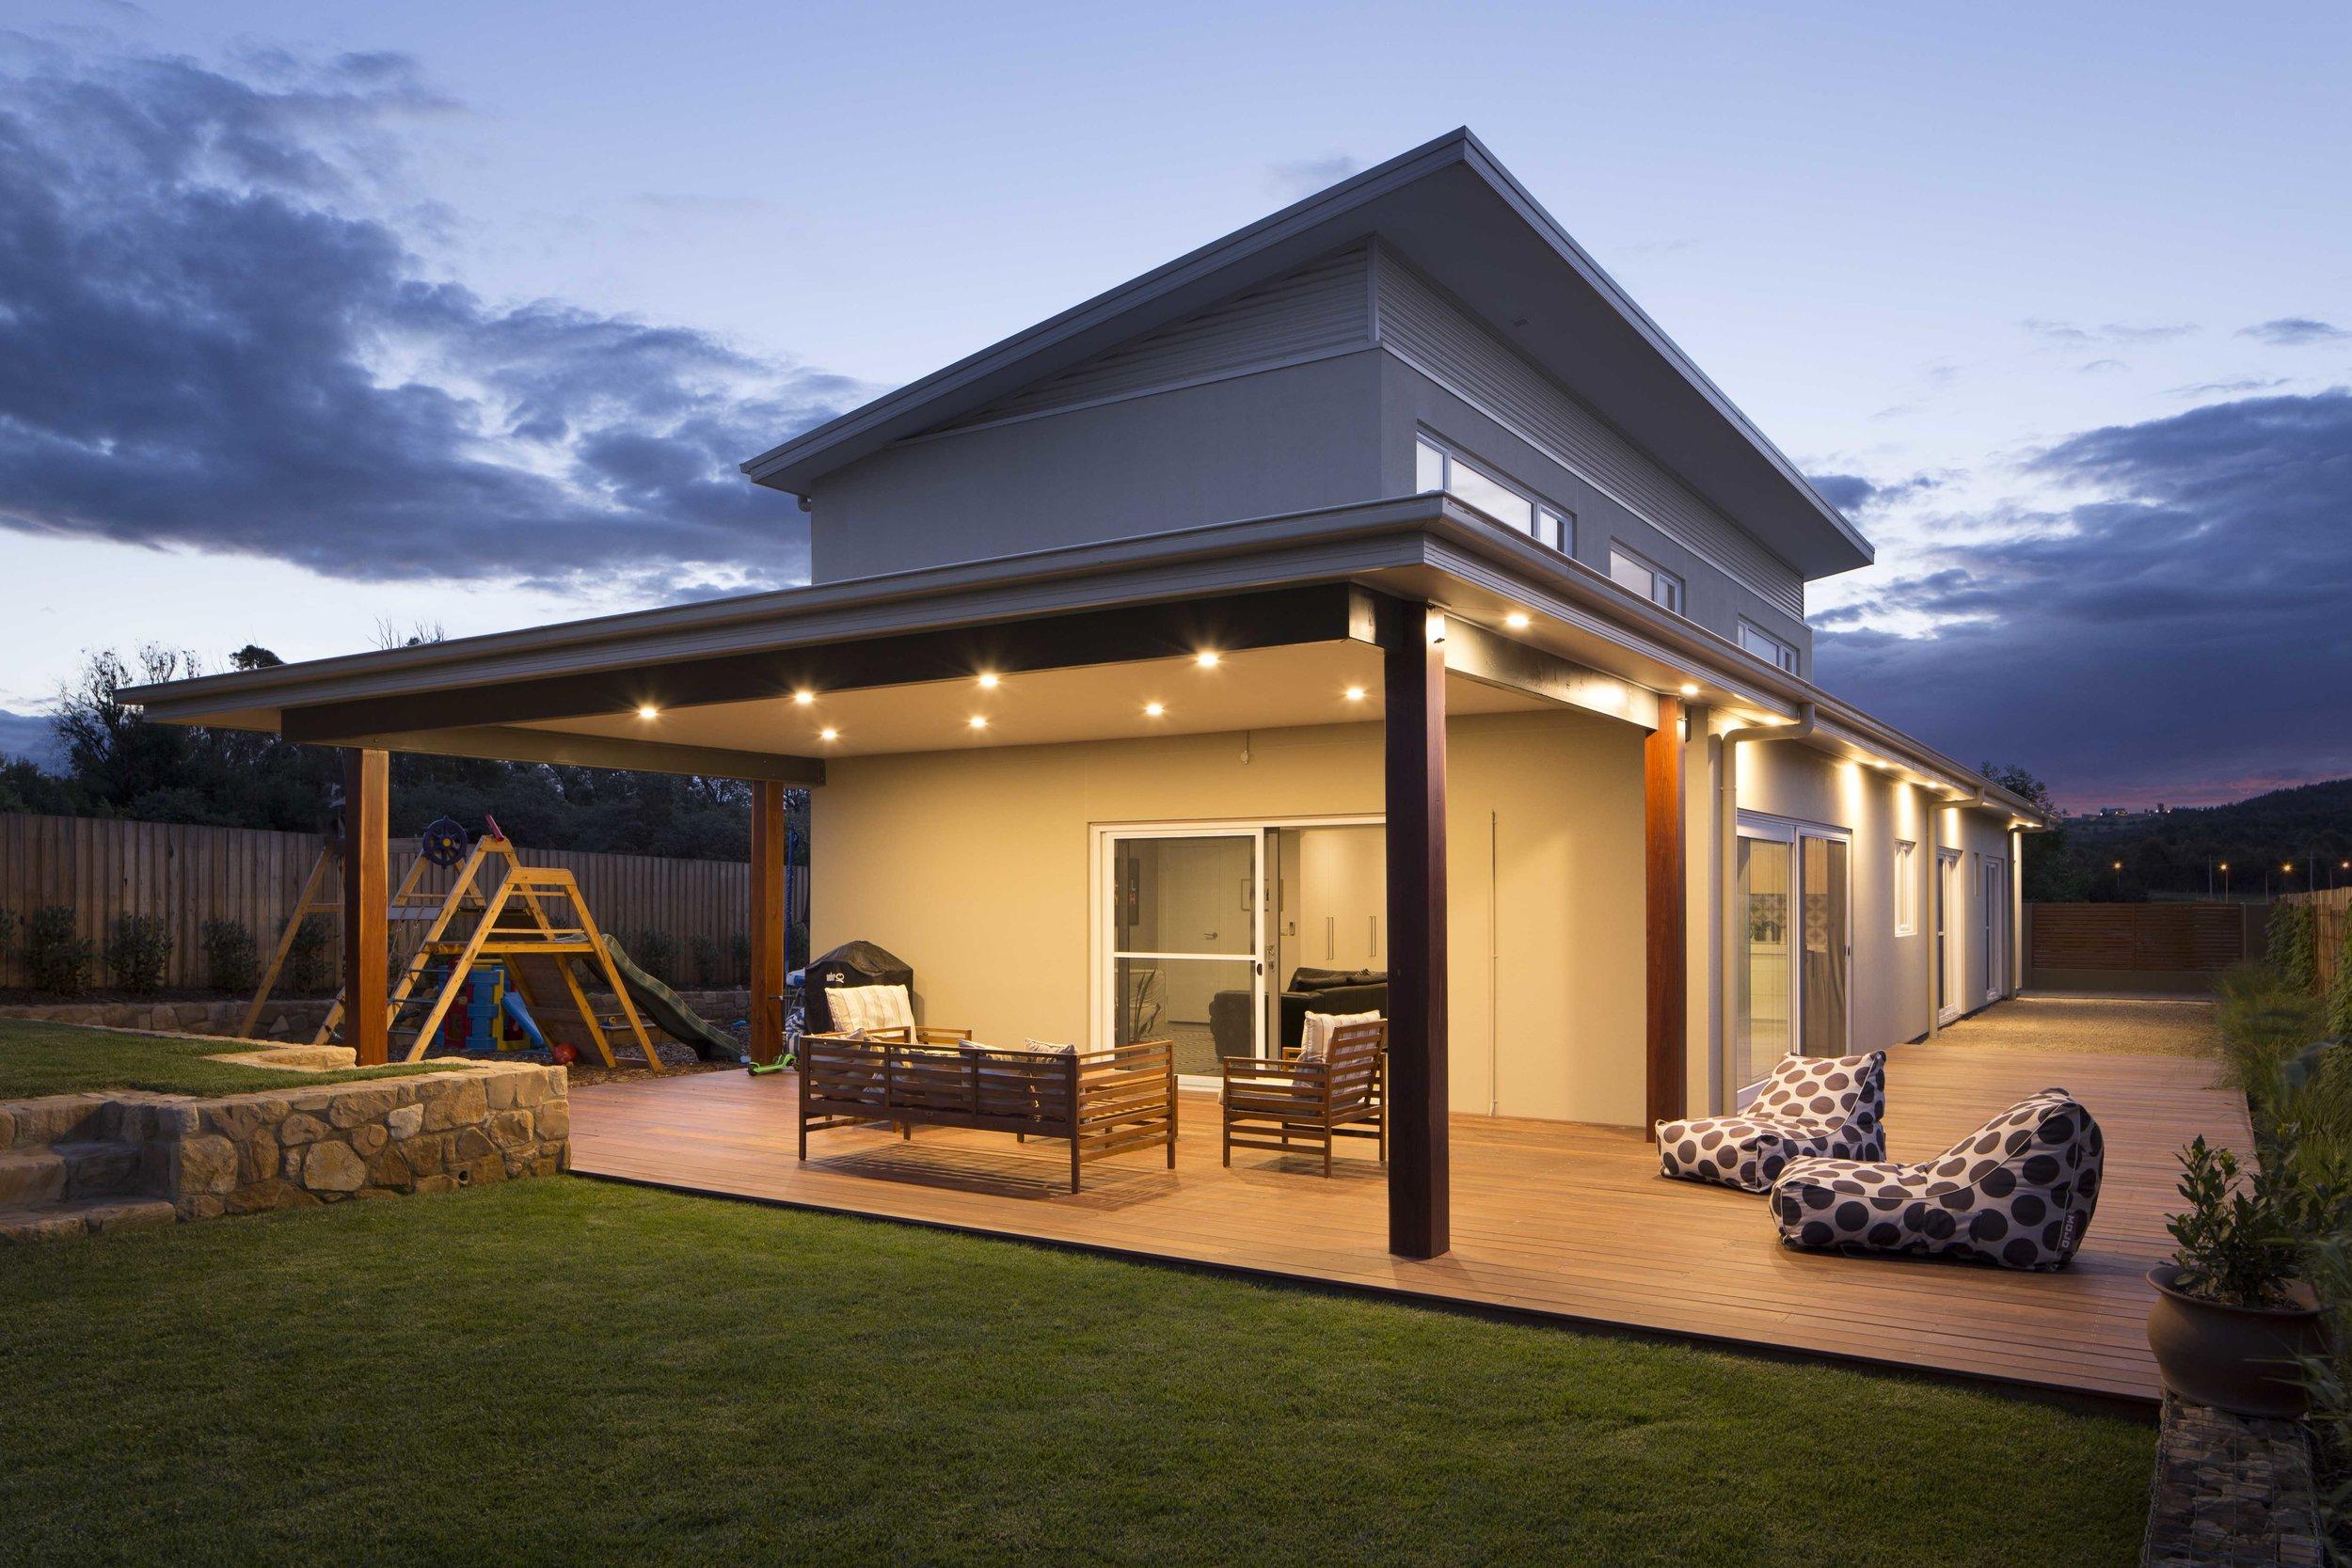 marina-mcdonald-architectural-photography-rogers-design-&-construction-exterior-deck